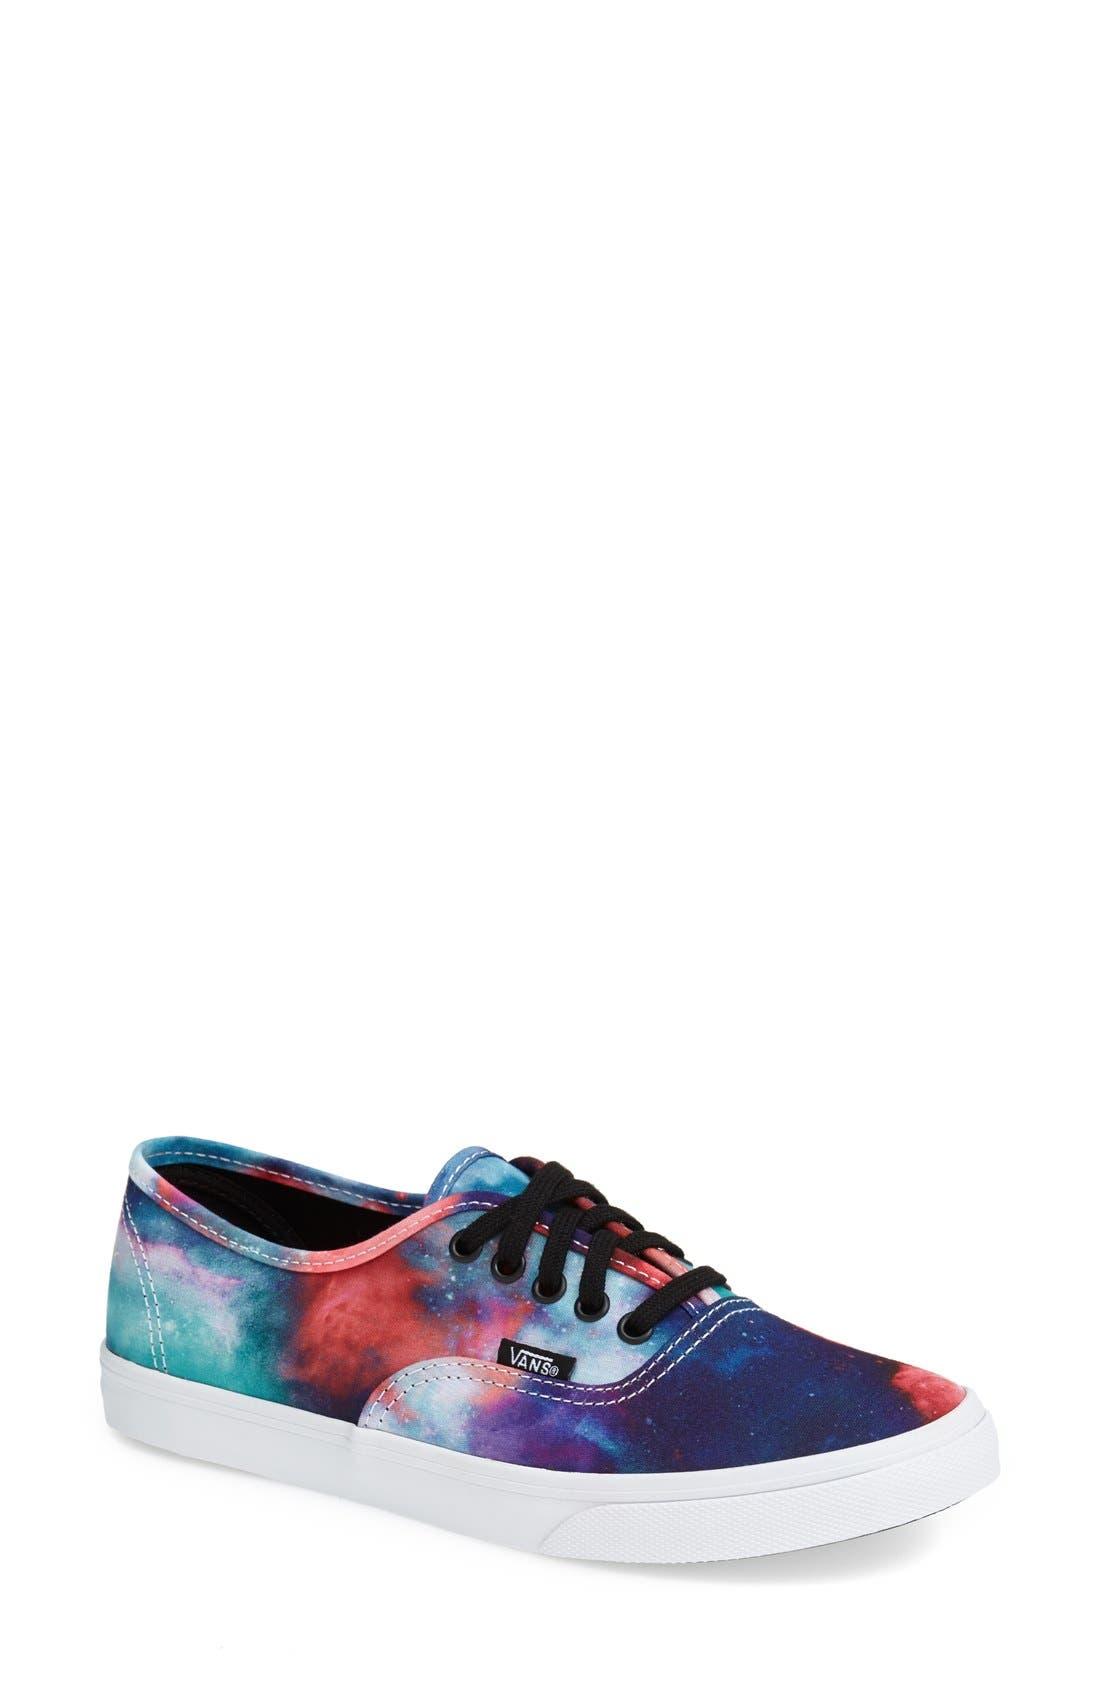 Alternate Image 1 Selected - Vans 'Authentic - Lo Pro' Sneaker (Women)